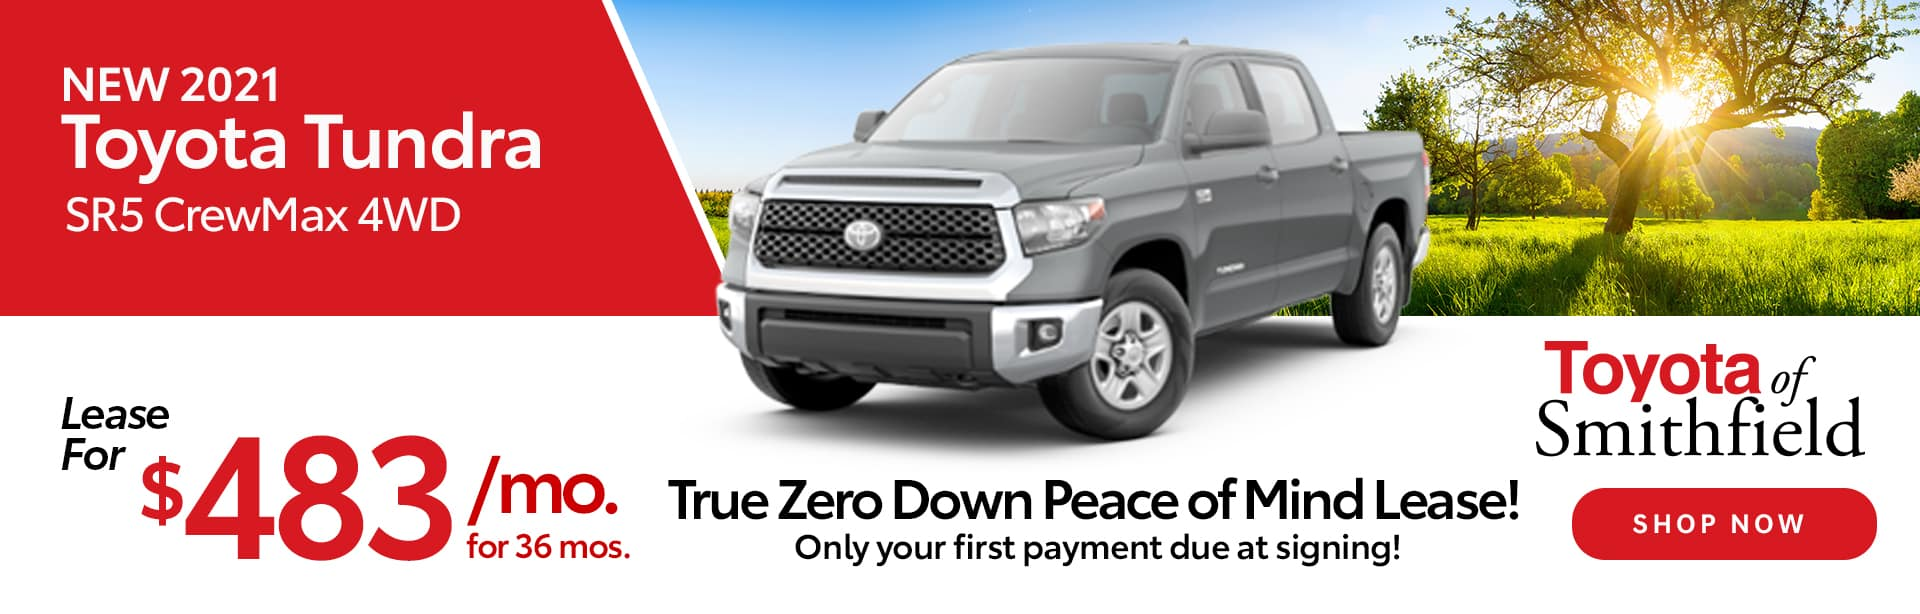 TOS_1920x614_NEW 2021_Toyota Tundra SR5 CrewMax 4WD_06'21